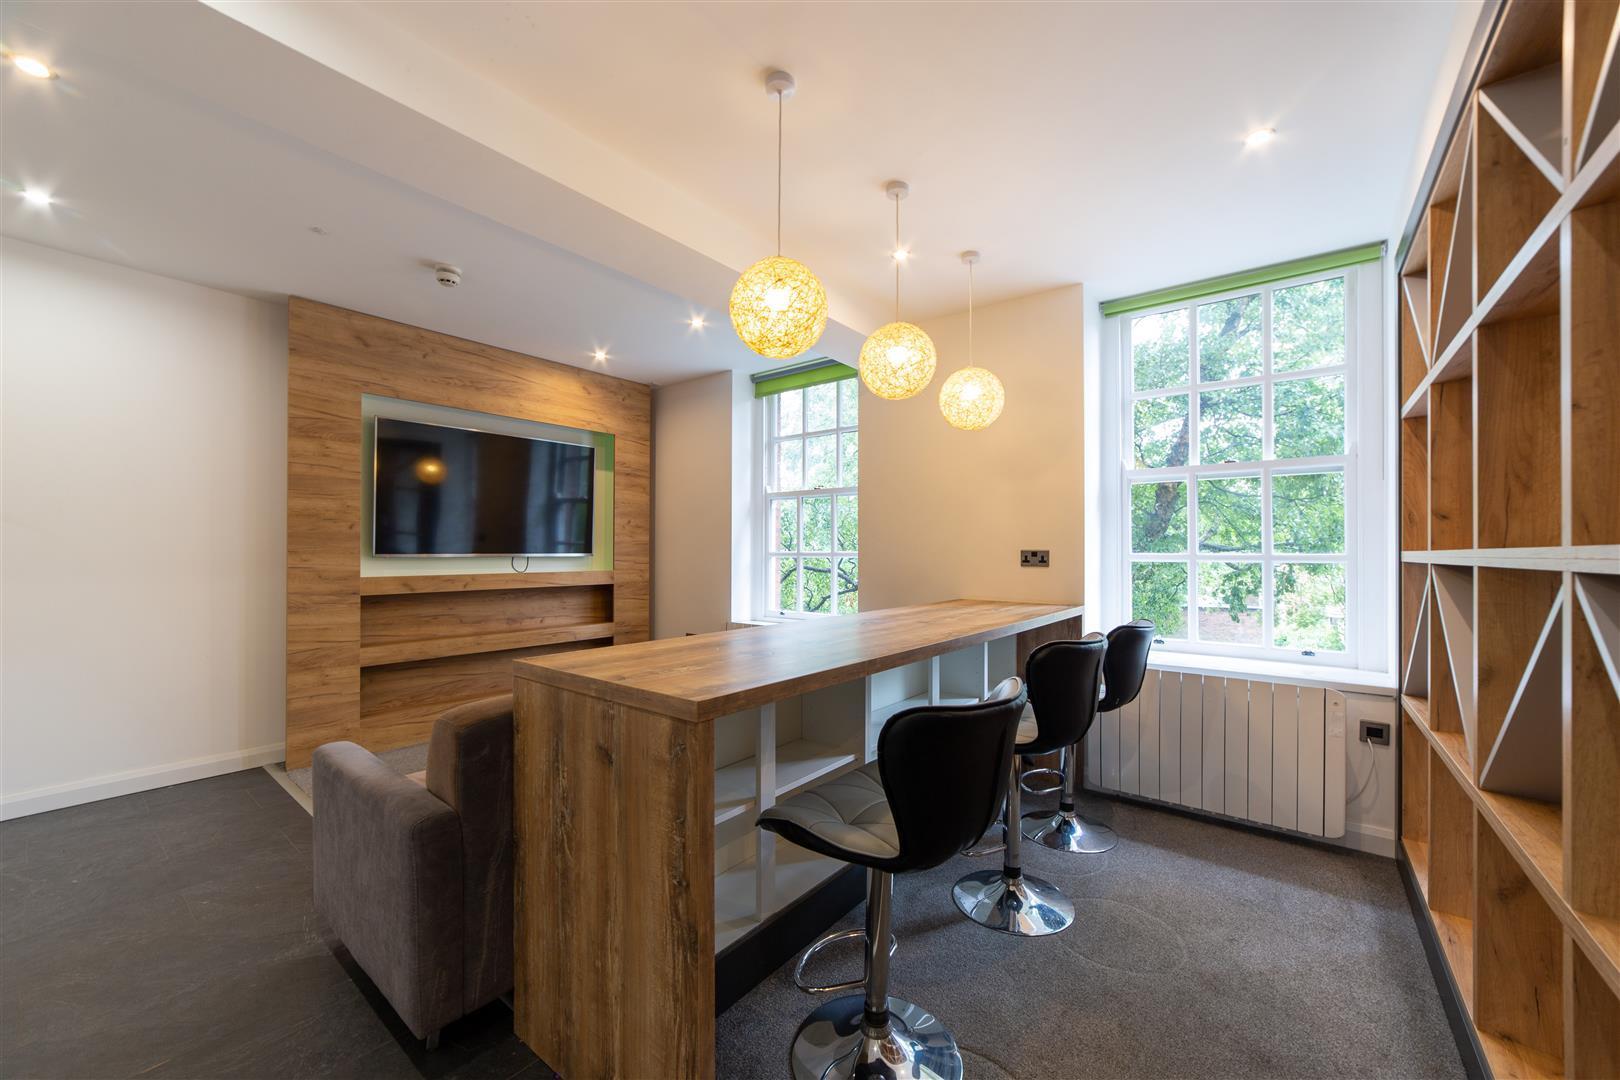 5 bed apartment to rent in Jesmond, NE2 4DN, NE2